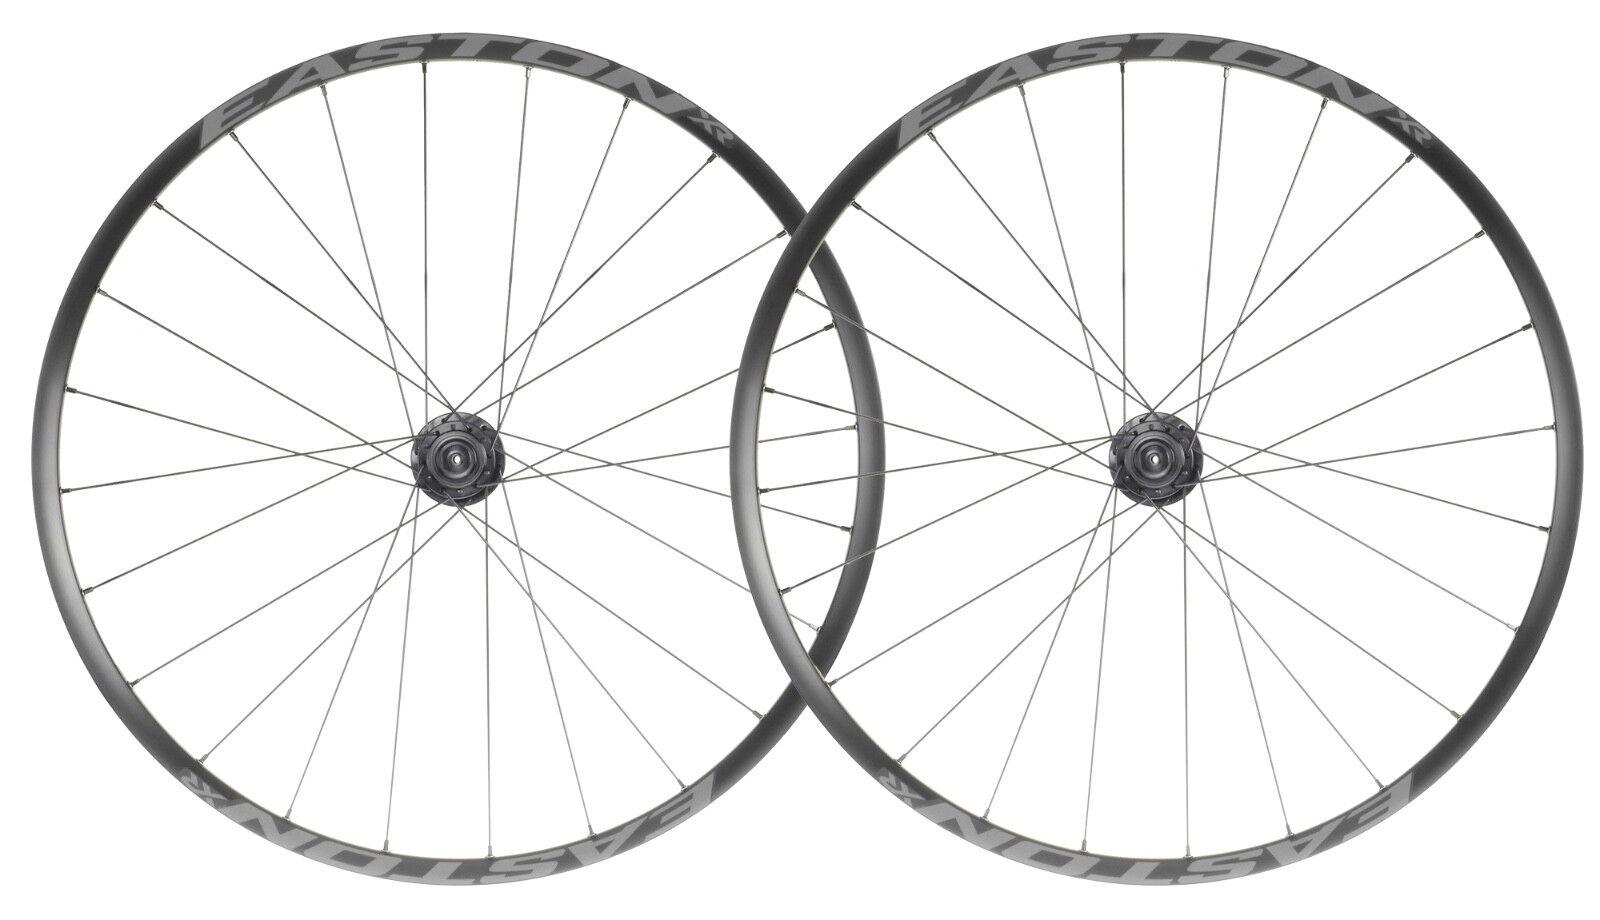 EASTON XR Mountain Bike Bicycle Clincher Aluminum Wheelset 27.5  11 Speed QR